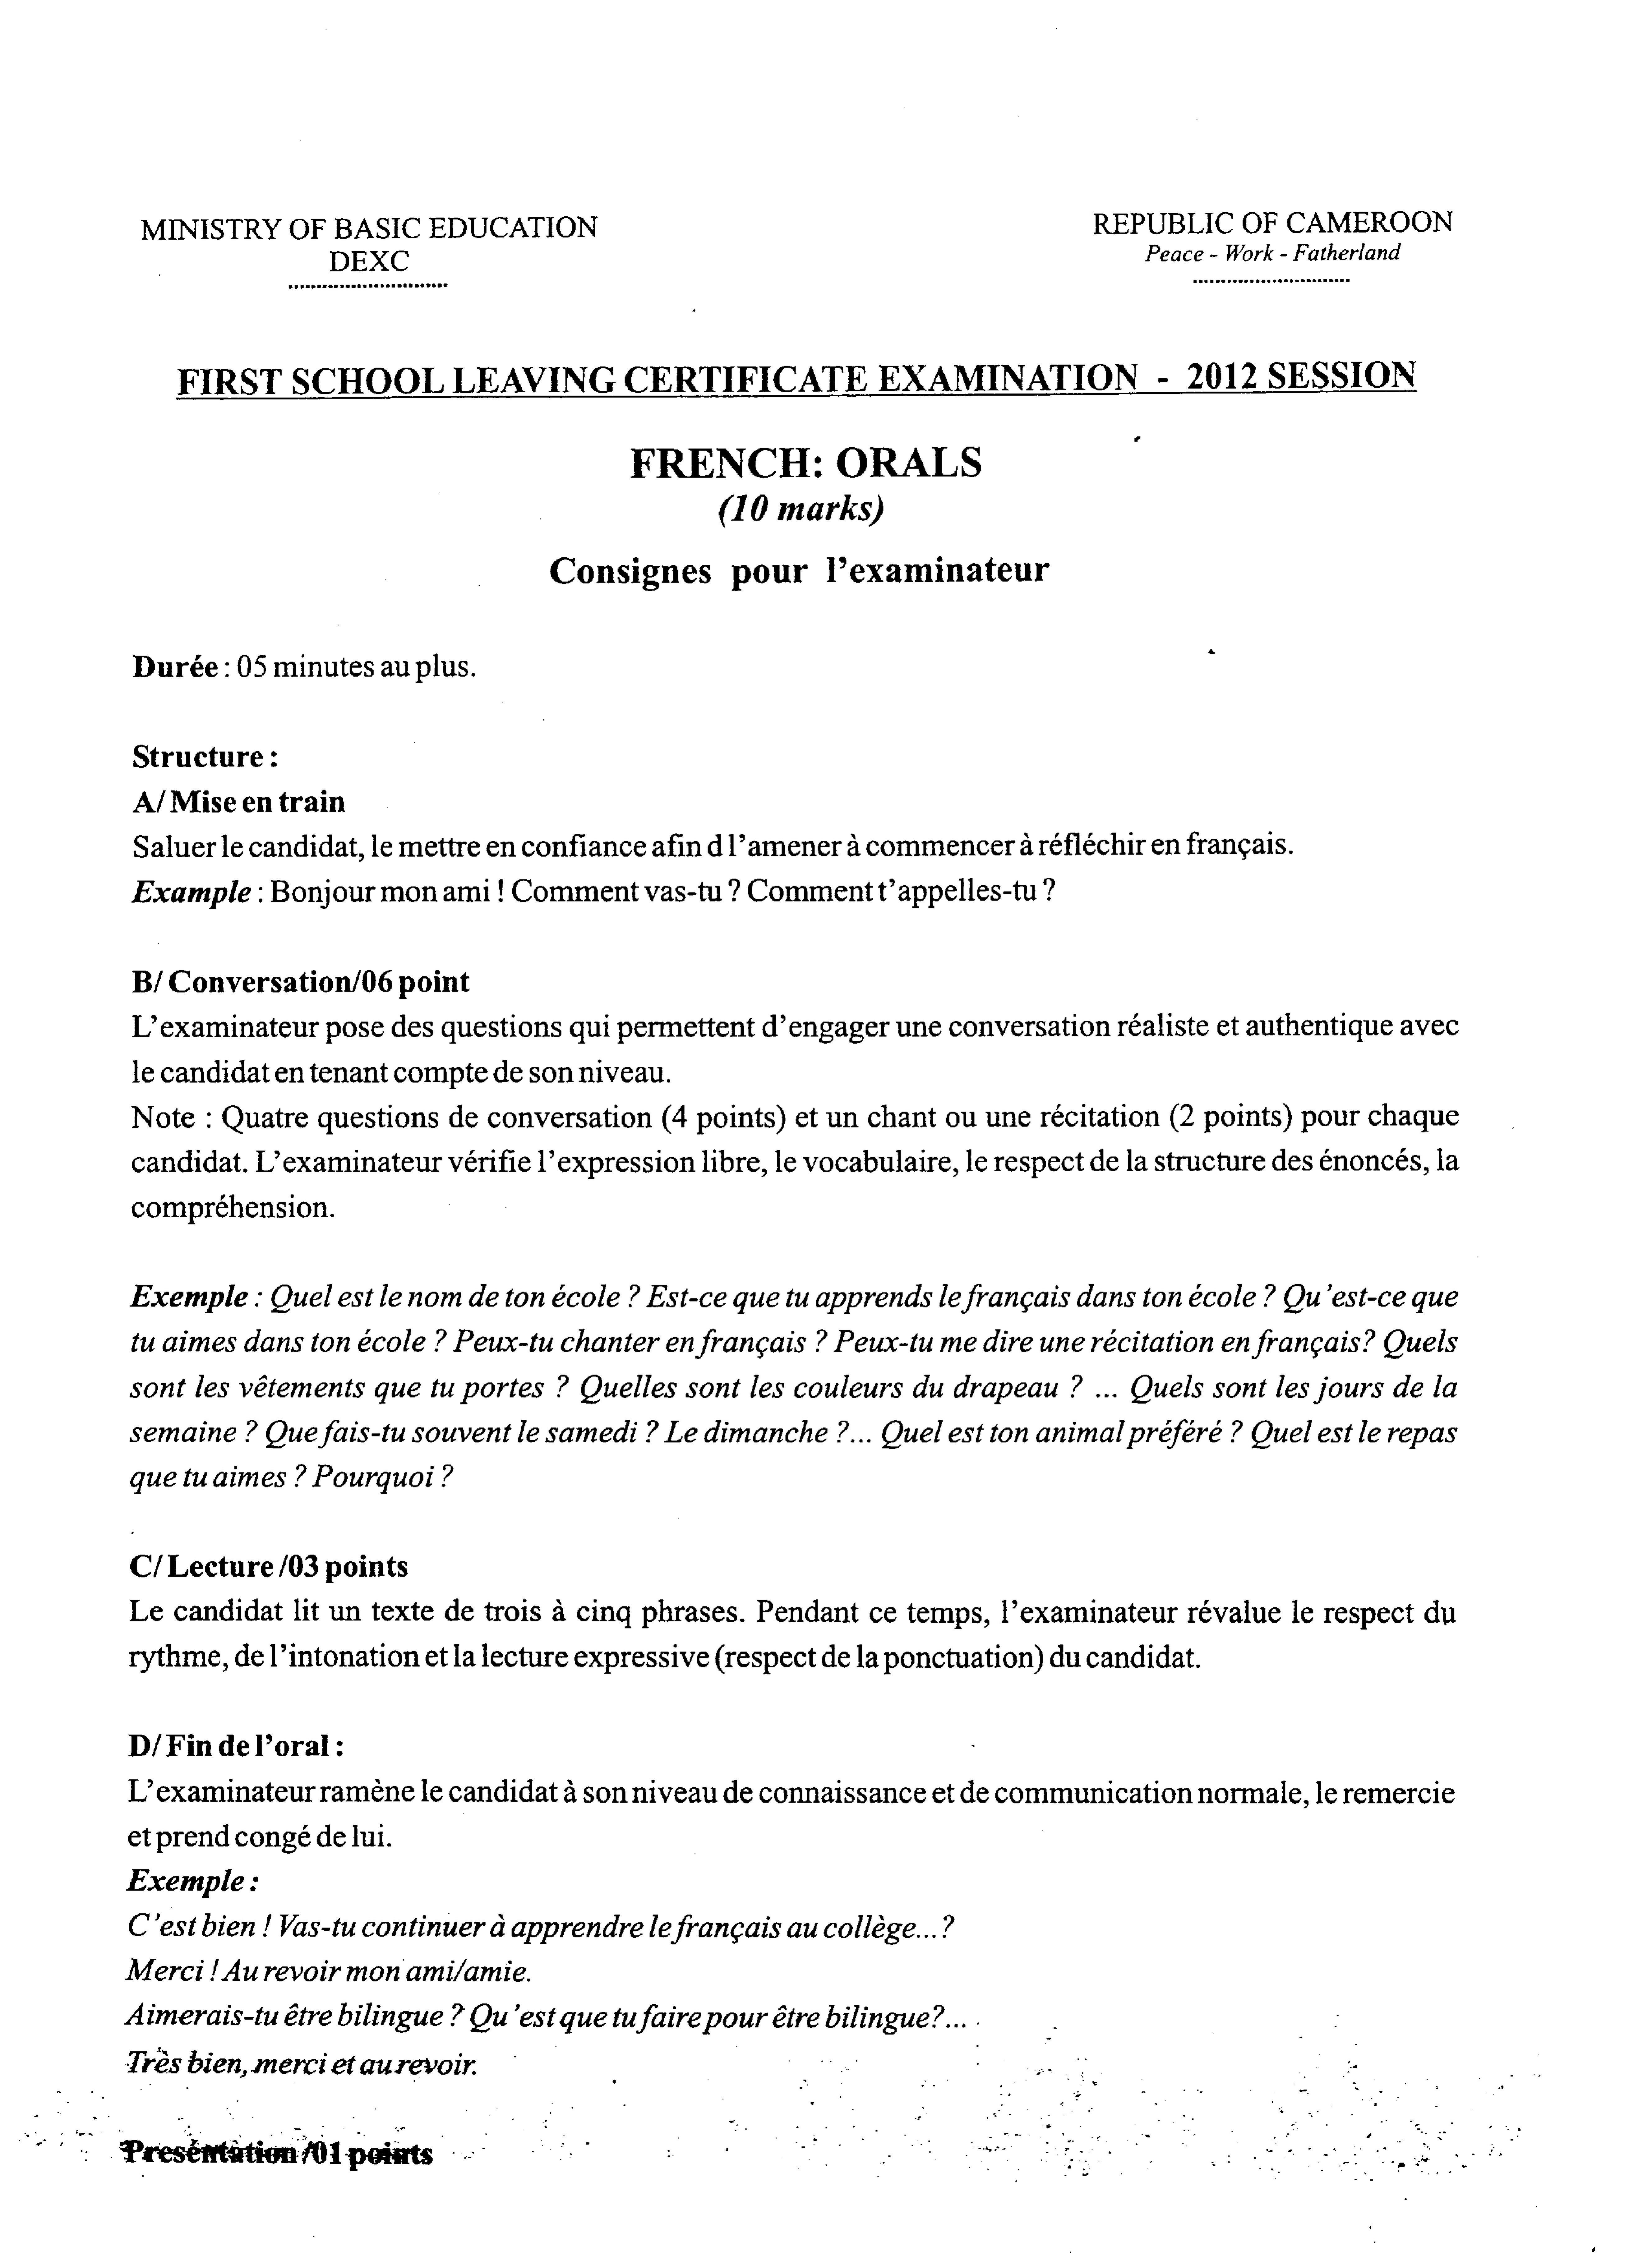 Filefirst school leaving certificate examination2012pdf filefirst school leaving certificate examination2012pdf yadclub Gallery